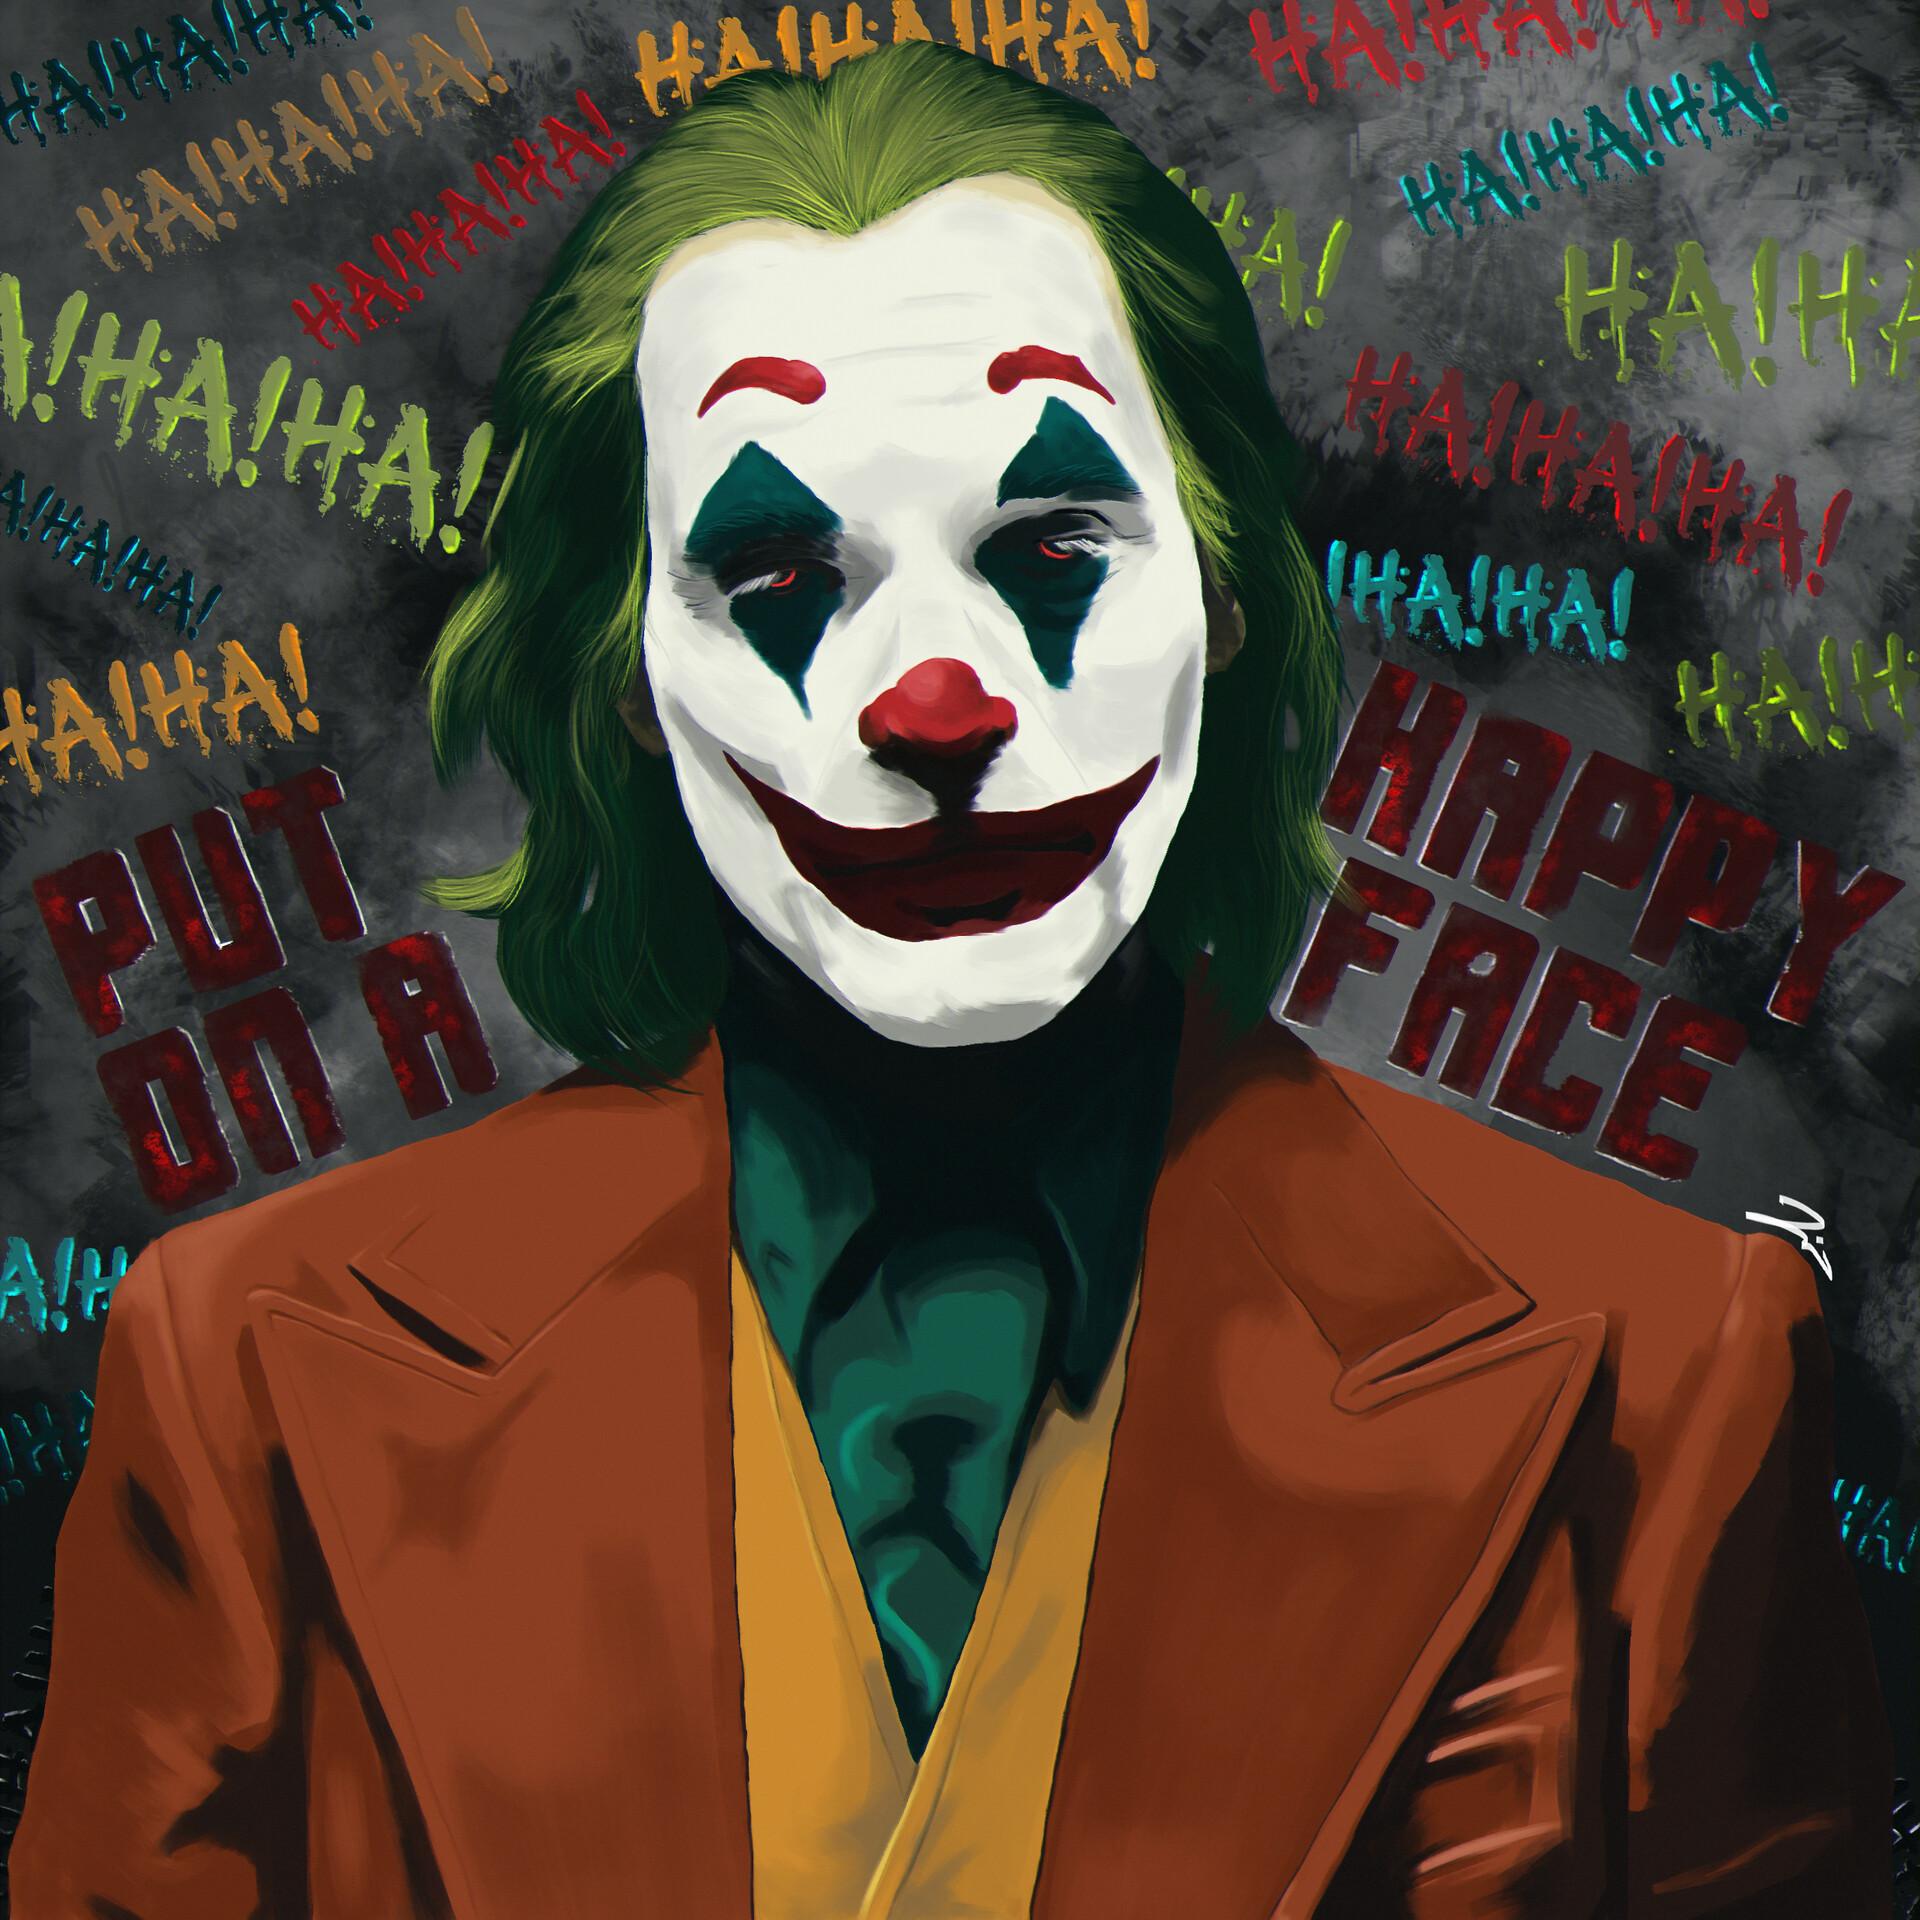 Artstation Joker 2019 Joaquin Phoenix Artwork Maha Rishen